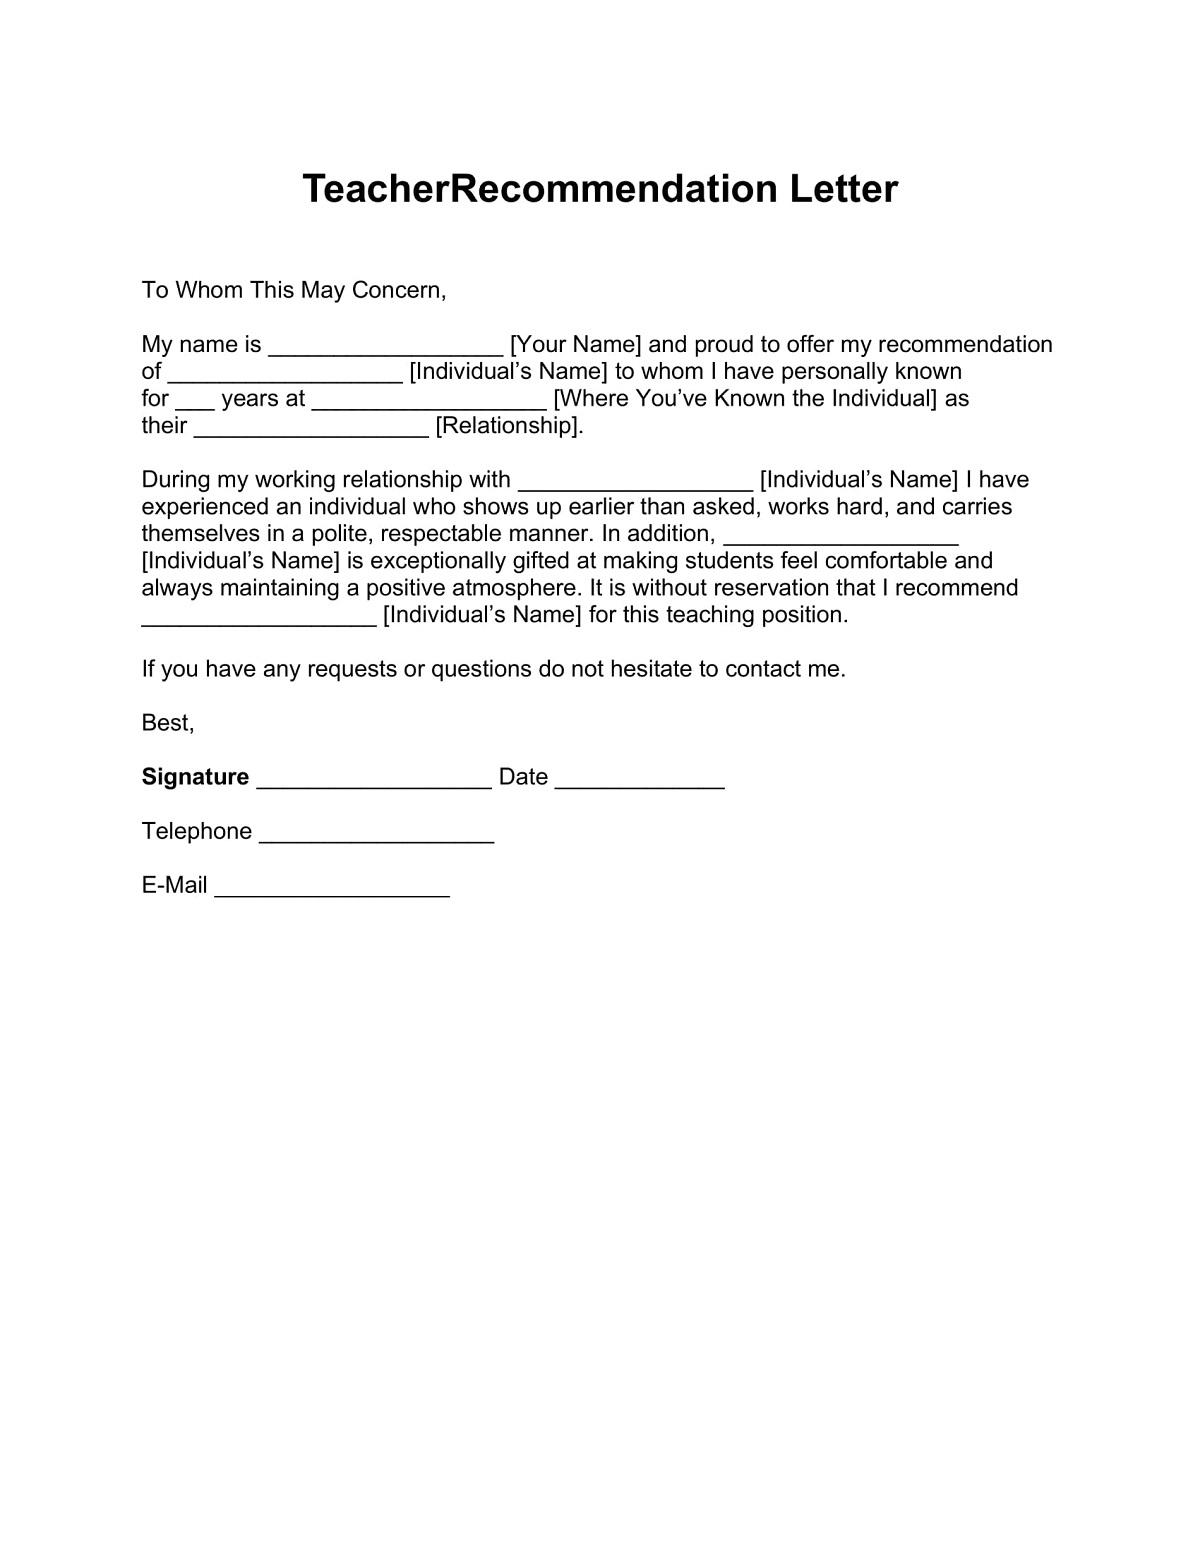 Teacher-Recommendation-Letter-Template-1